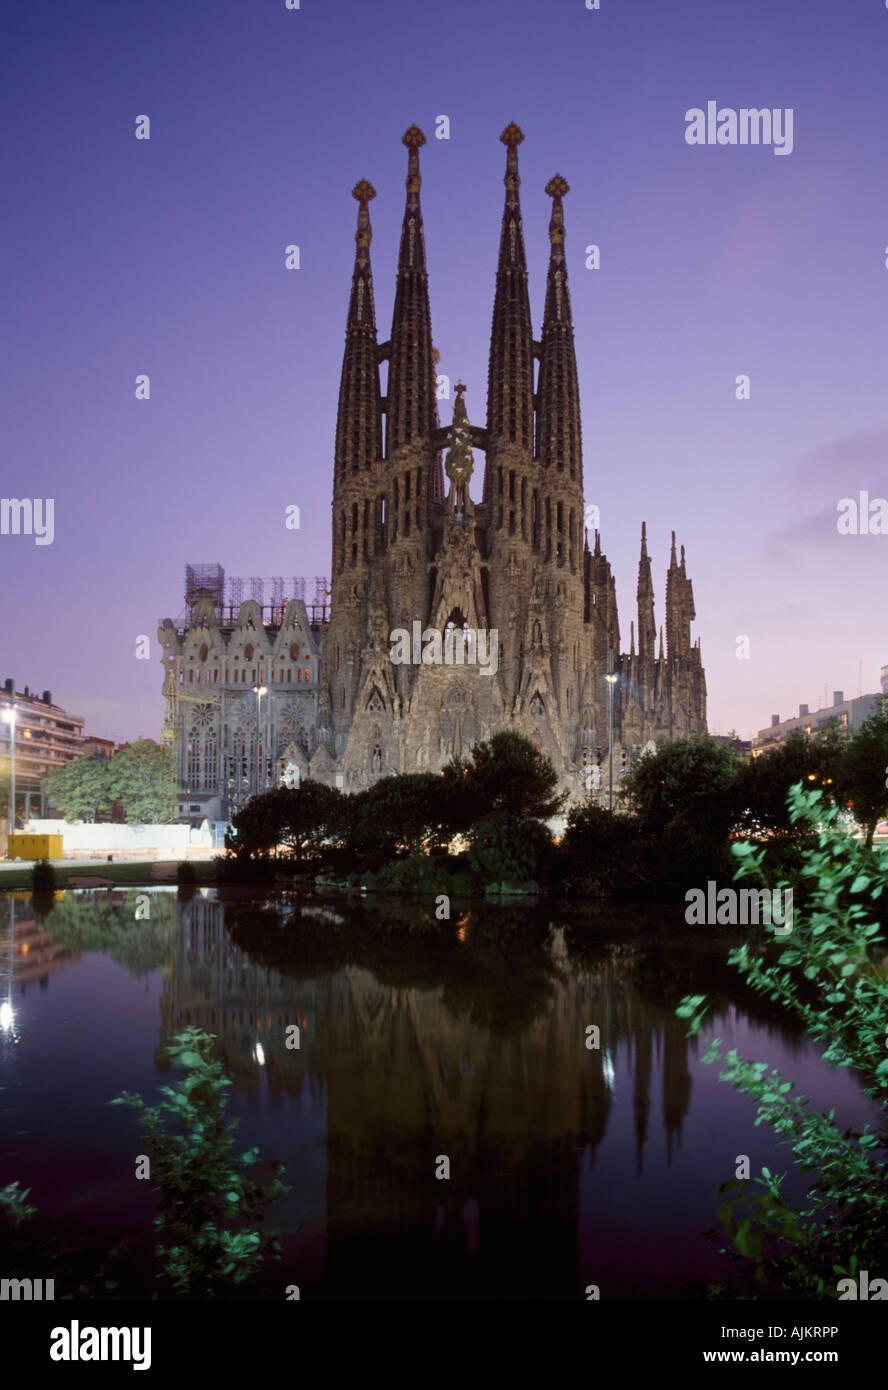 Sagrada Familia Kathedrale Tempel Expaitori De La Sagrada Familia Barcelona Katalonien Spanien Stockbild